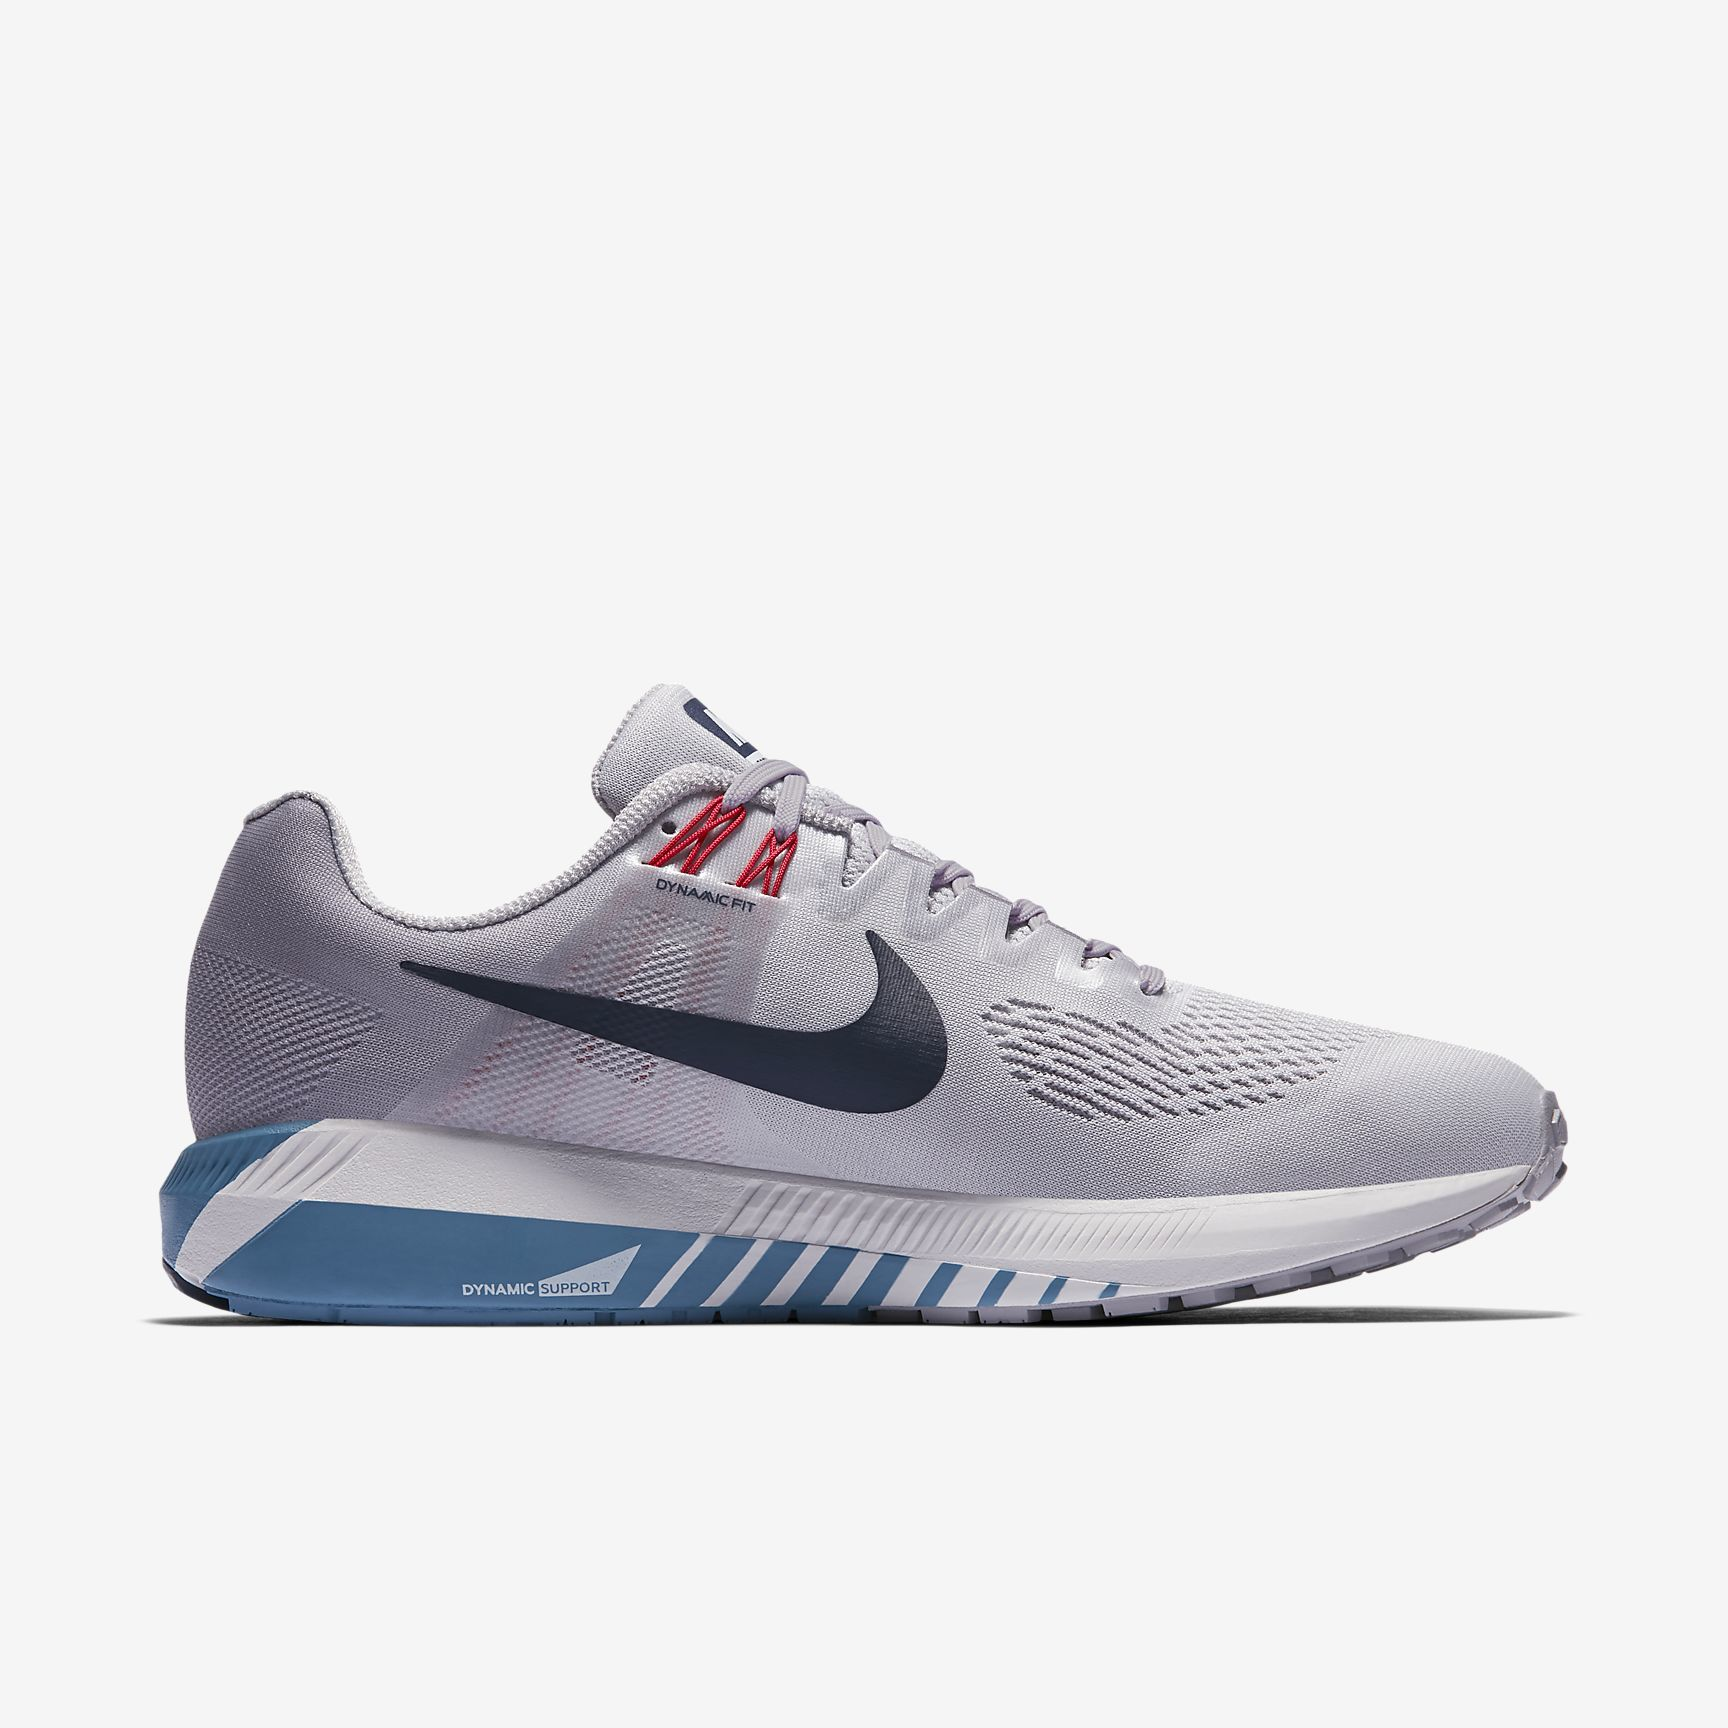 Nike Air Zoom Structure 21 in Grau Blau